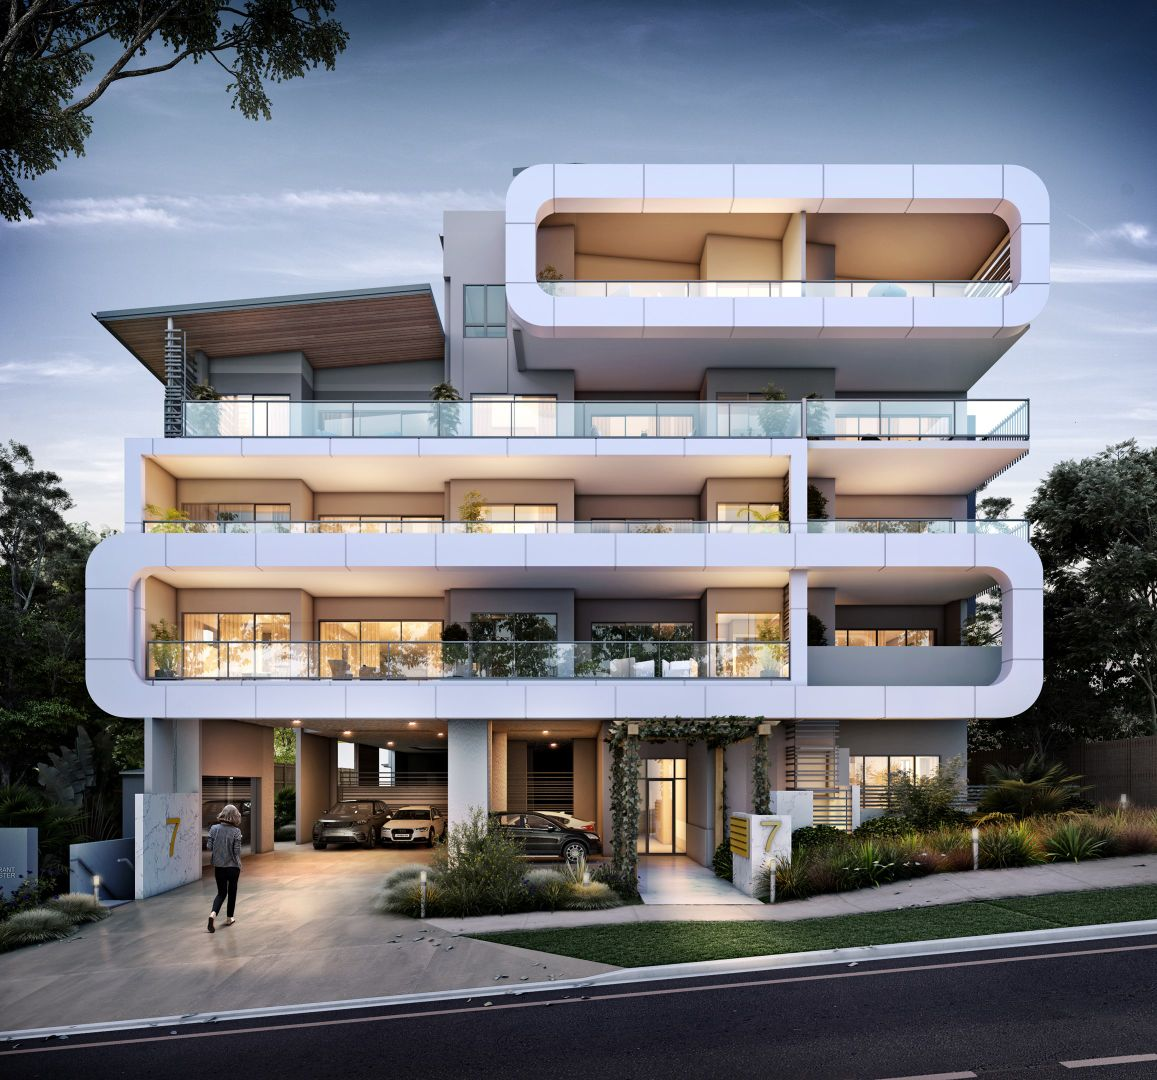 7 Thondley St, Windsor, QLD 4030, Image 0